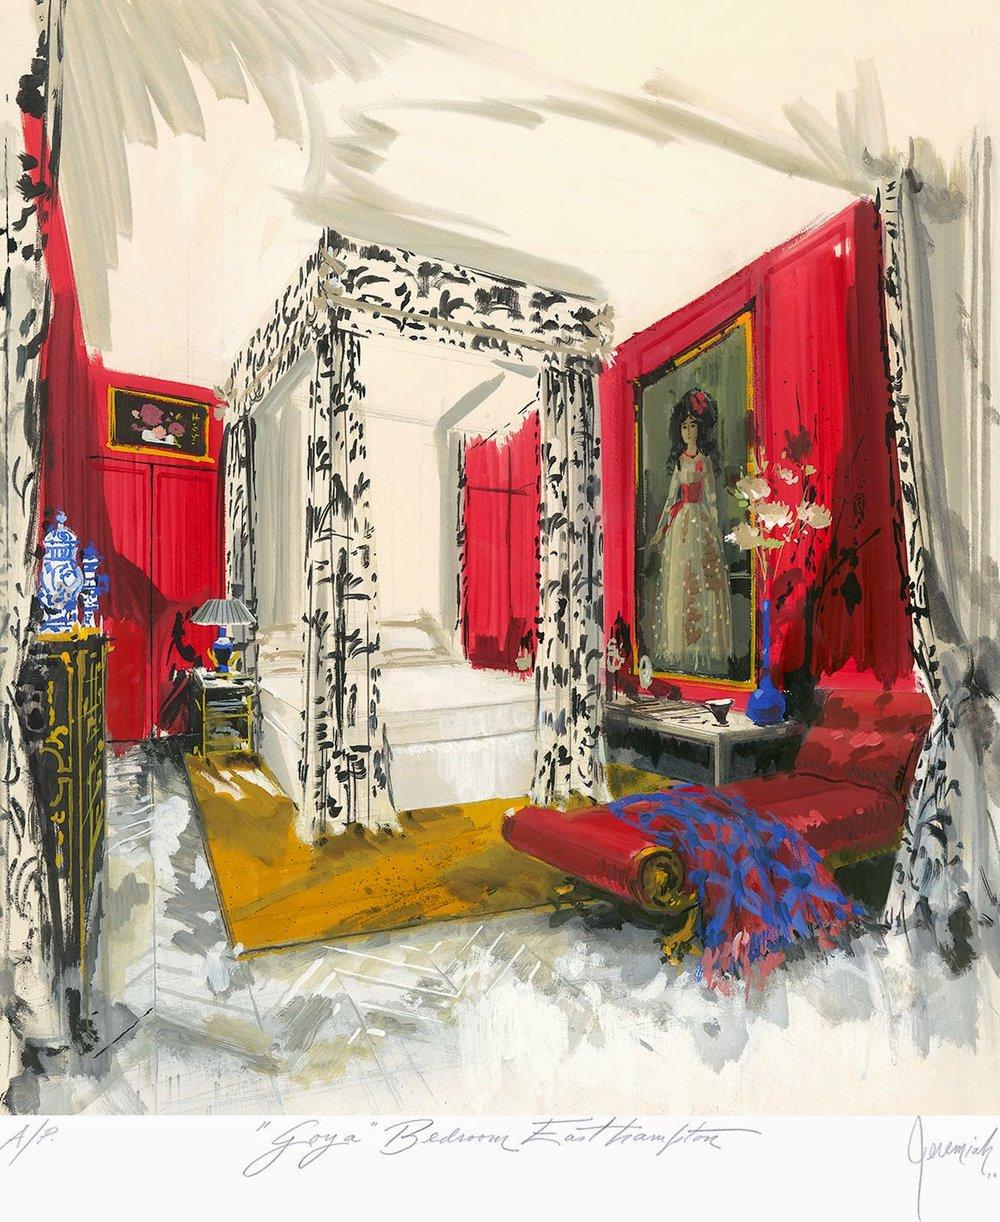 Jeremiah Goodman & the Art of Interiors